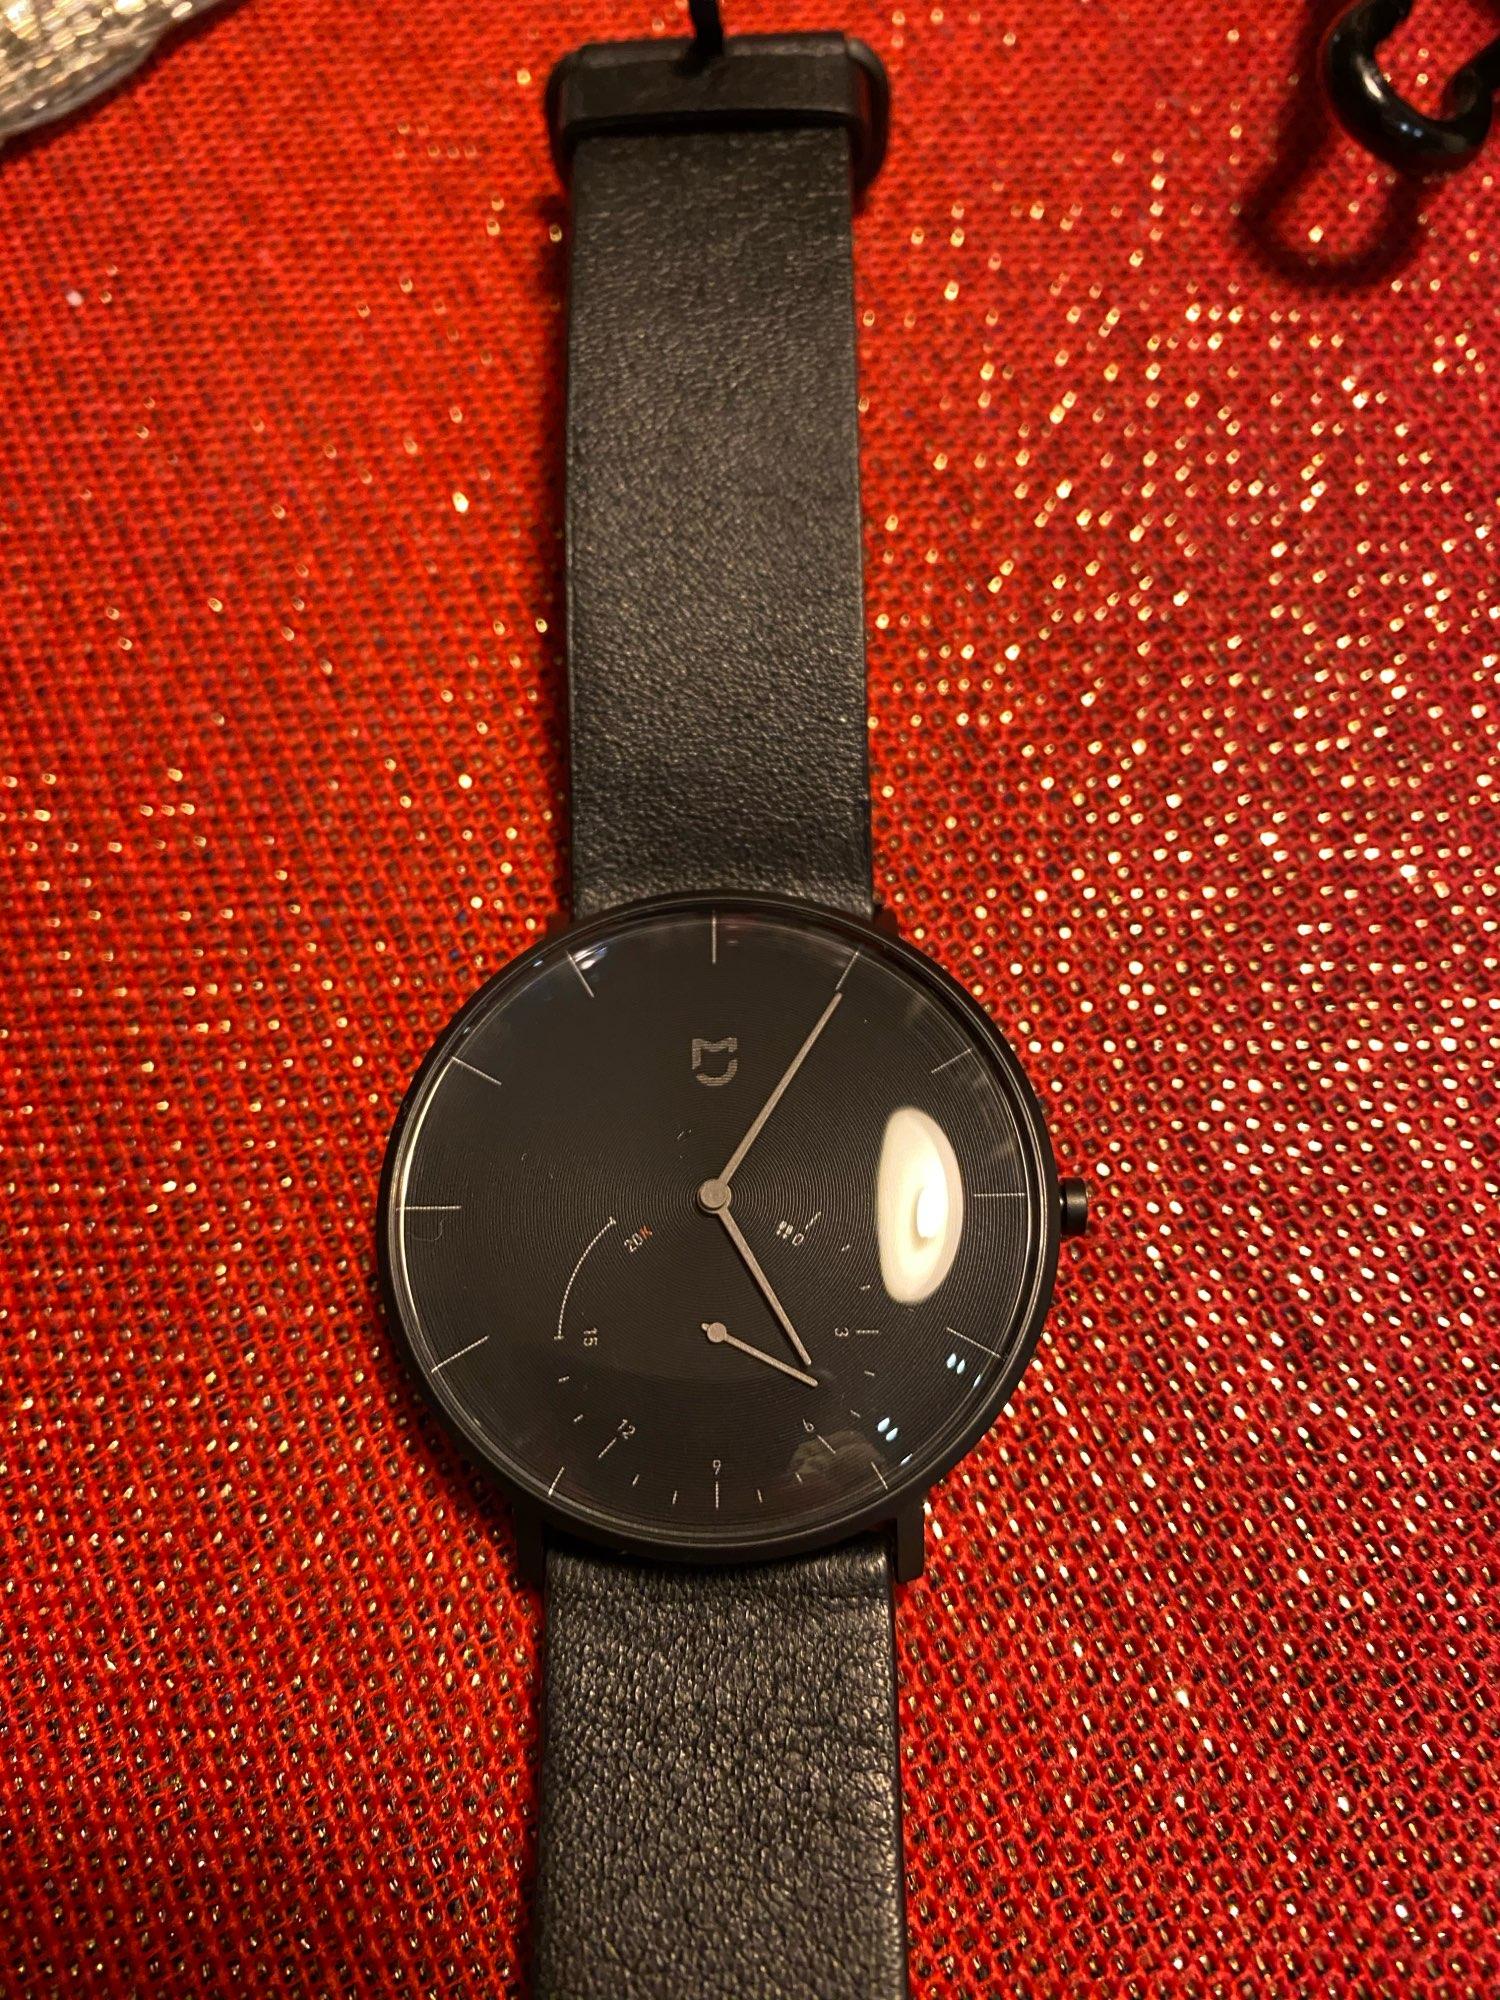 XIAOMI Mi Mijia QUARTZ Smart Watch Life Waterproof with Double Dials Alarm Sport Sensor Pedometer Time Leather Band Mi Home APP|Smart Watches|   - AliExpress